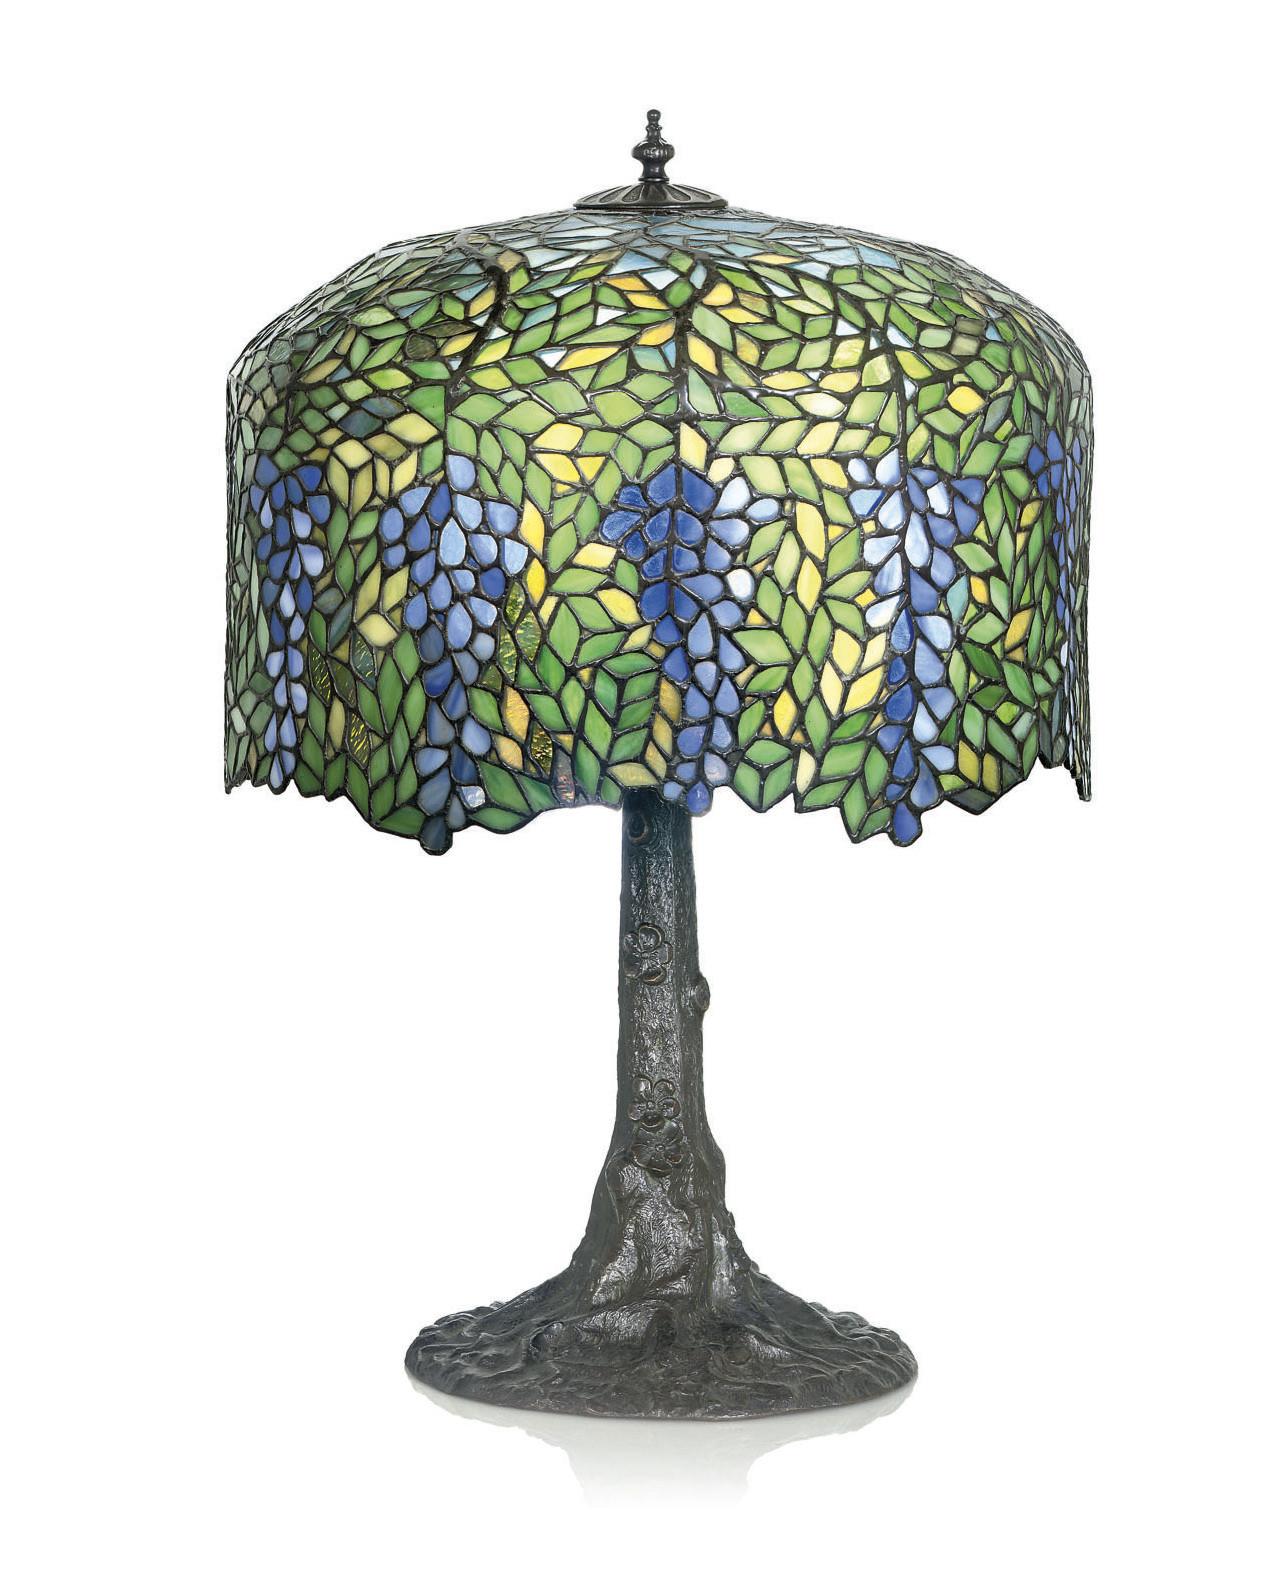 HANDEL LAMP COMPANY (1864-1936)